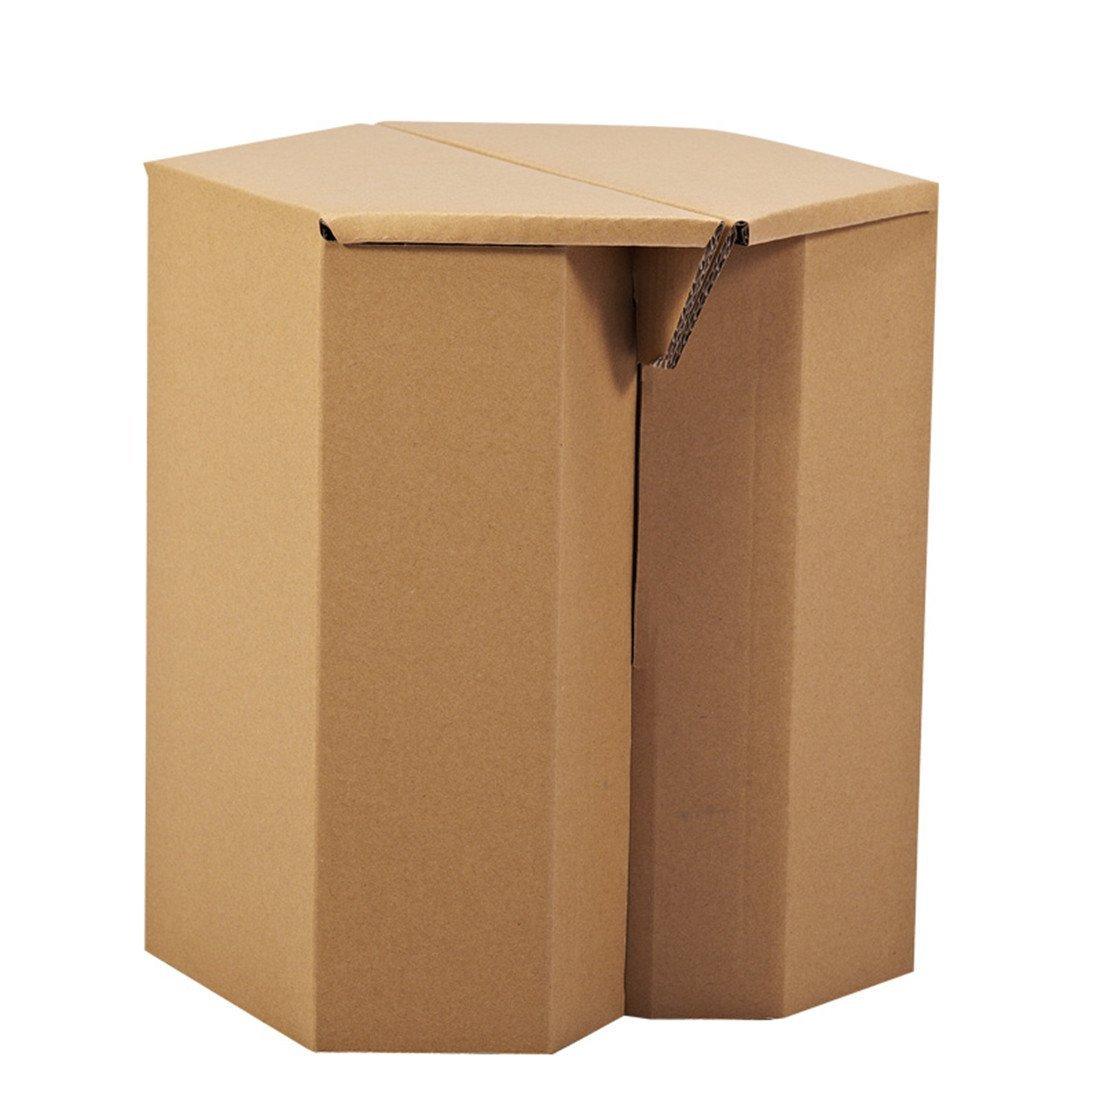 Get Quotations Paper Maker Diy Cardboard Hexagon Chair Children S Furniture 01hexagon Brown